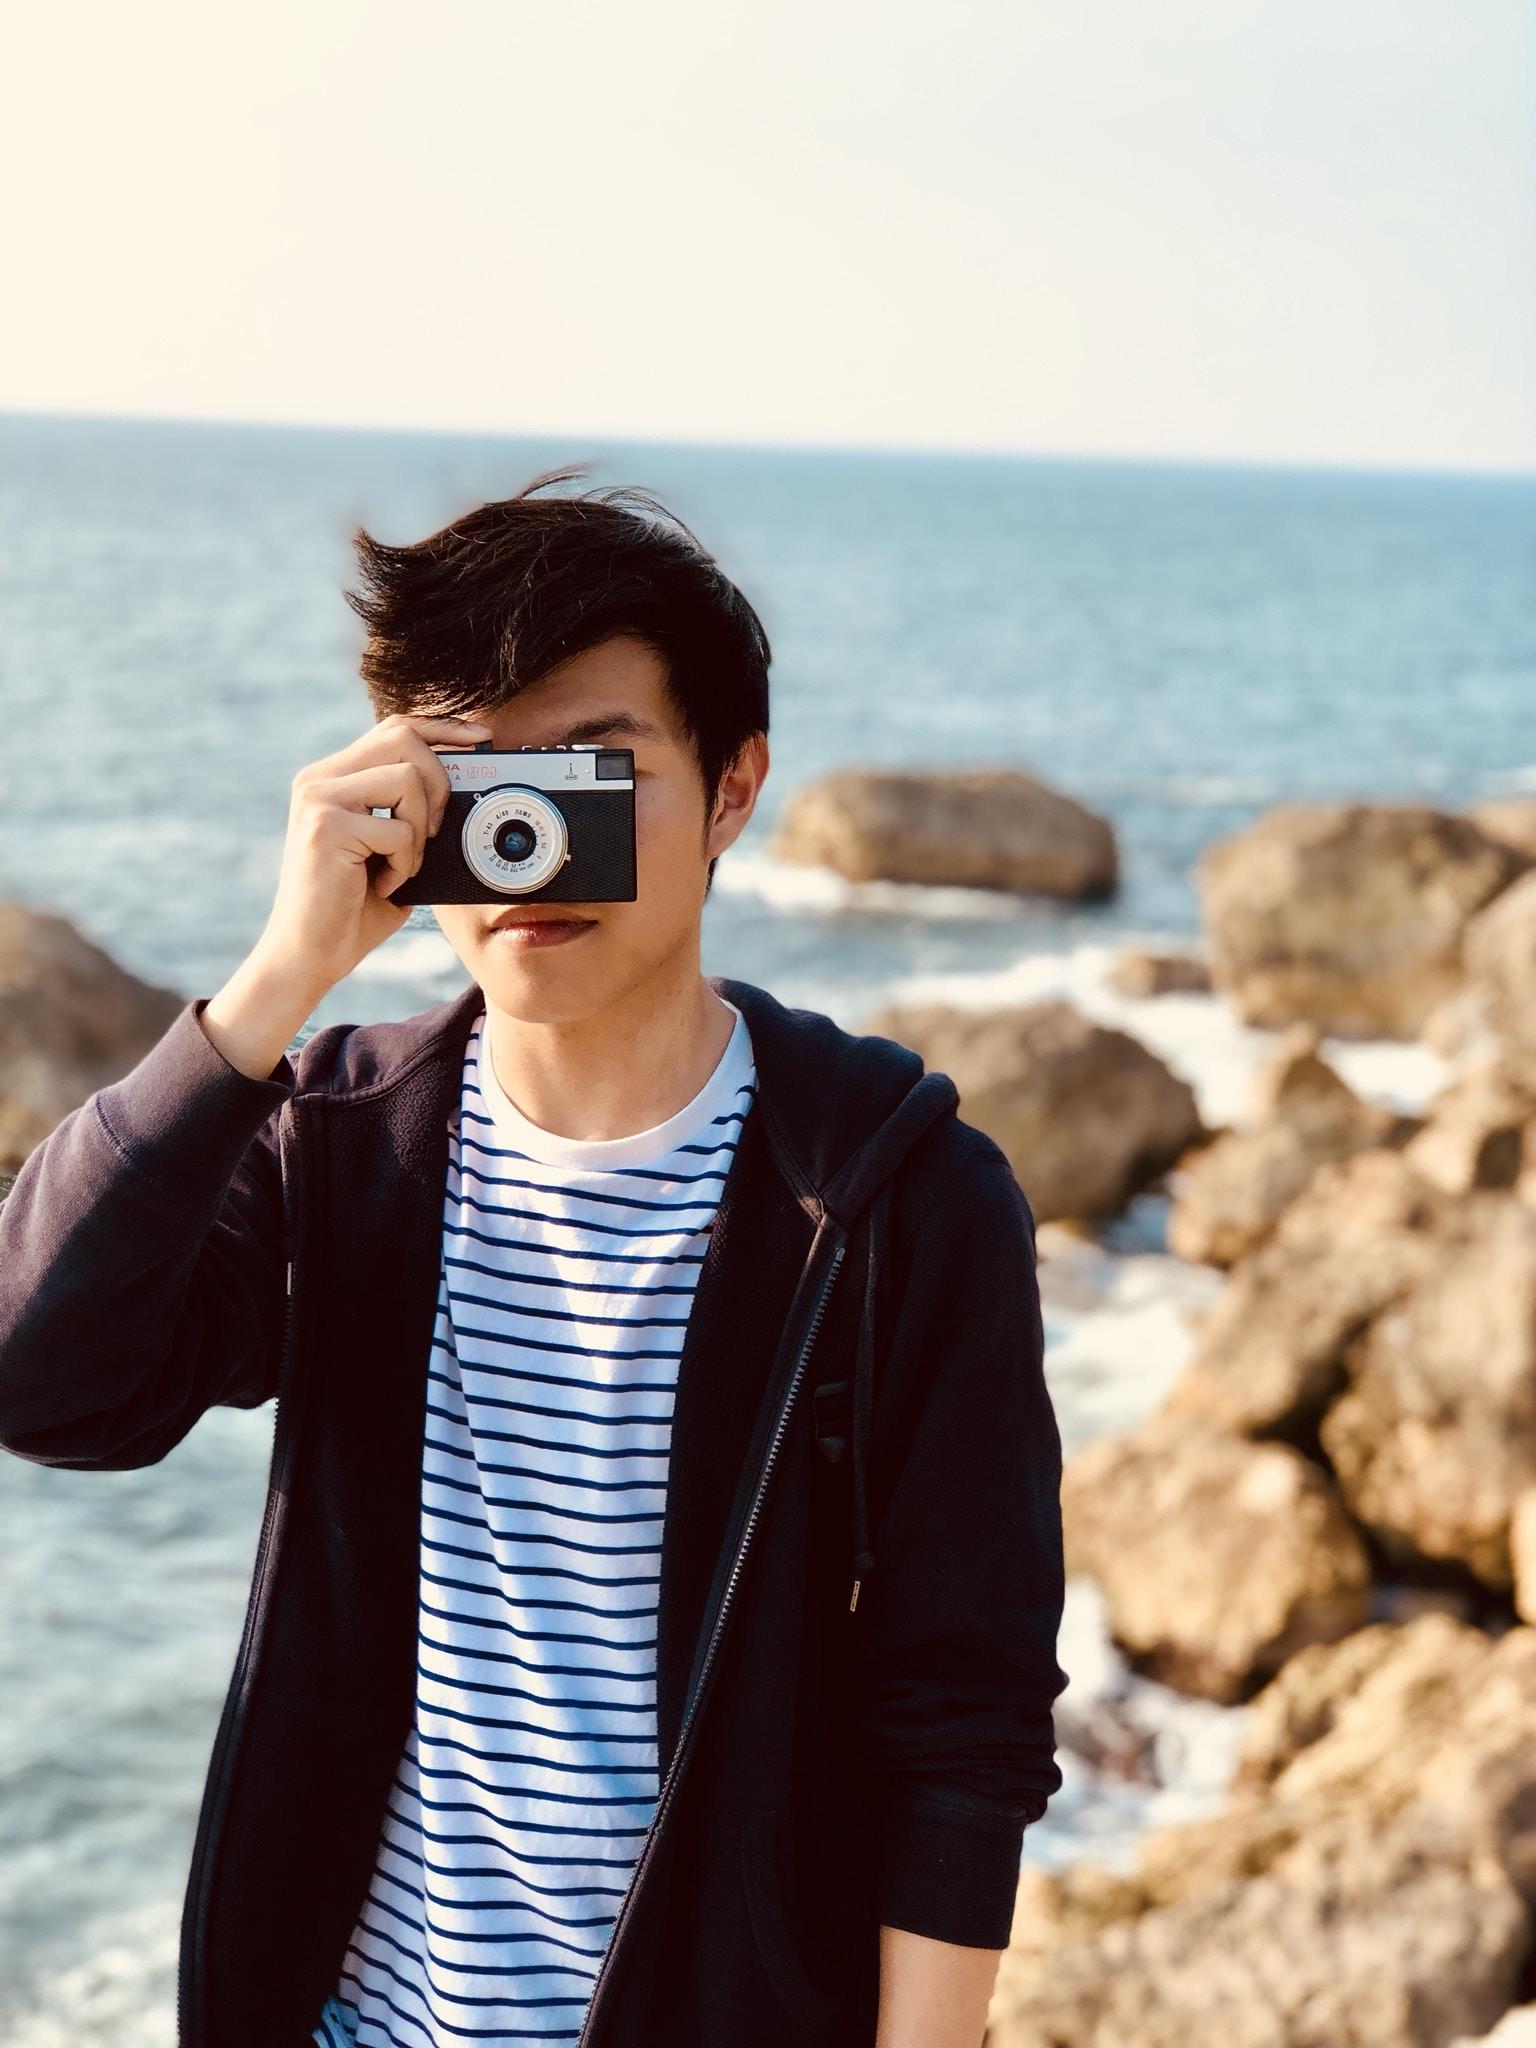 person taking photo using gray point-and-shoot camera near sea